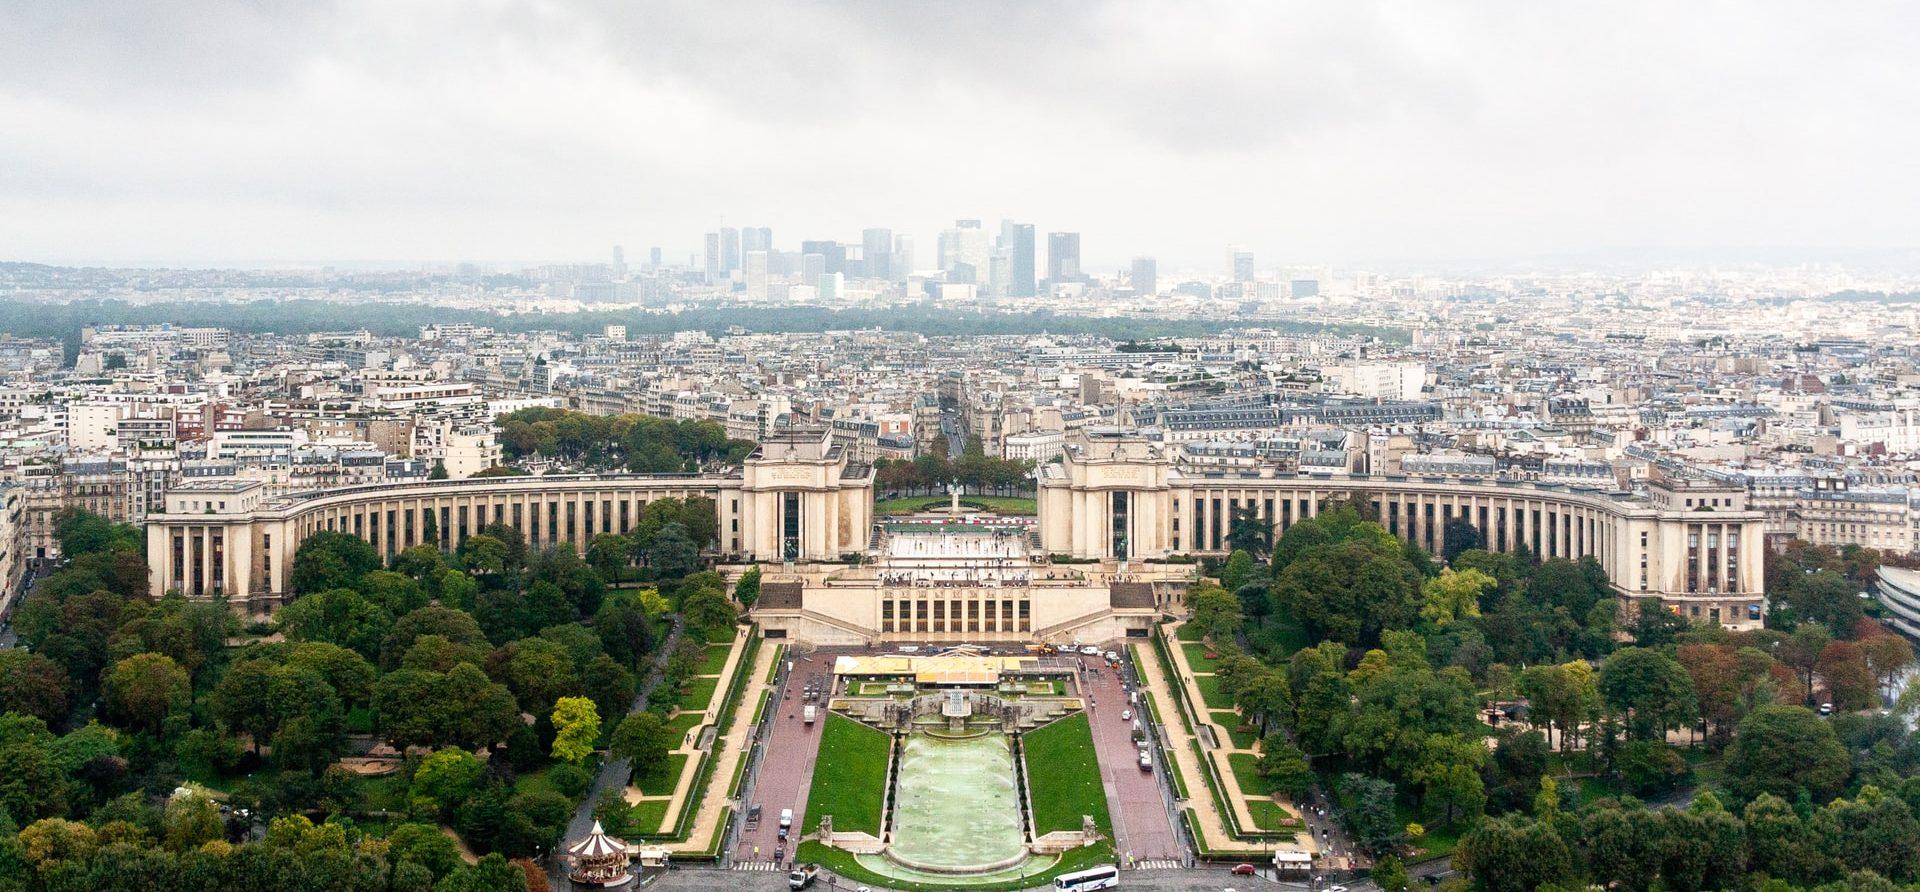 Trocadero facing the Eiffel Tower